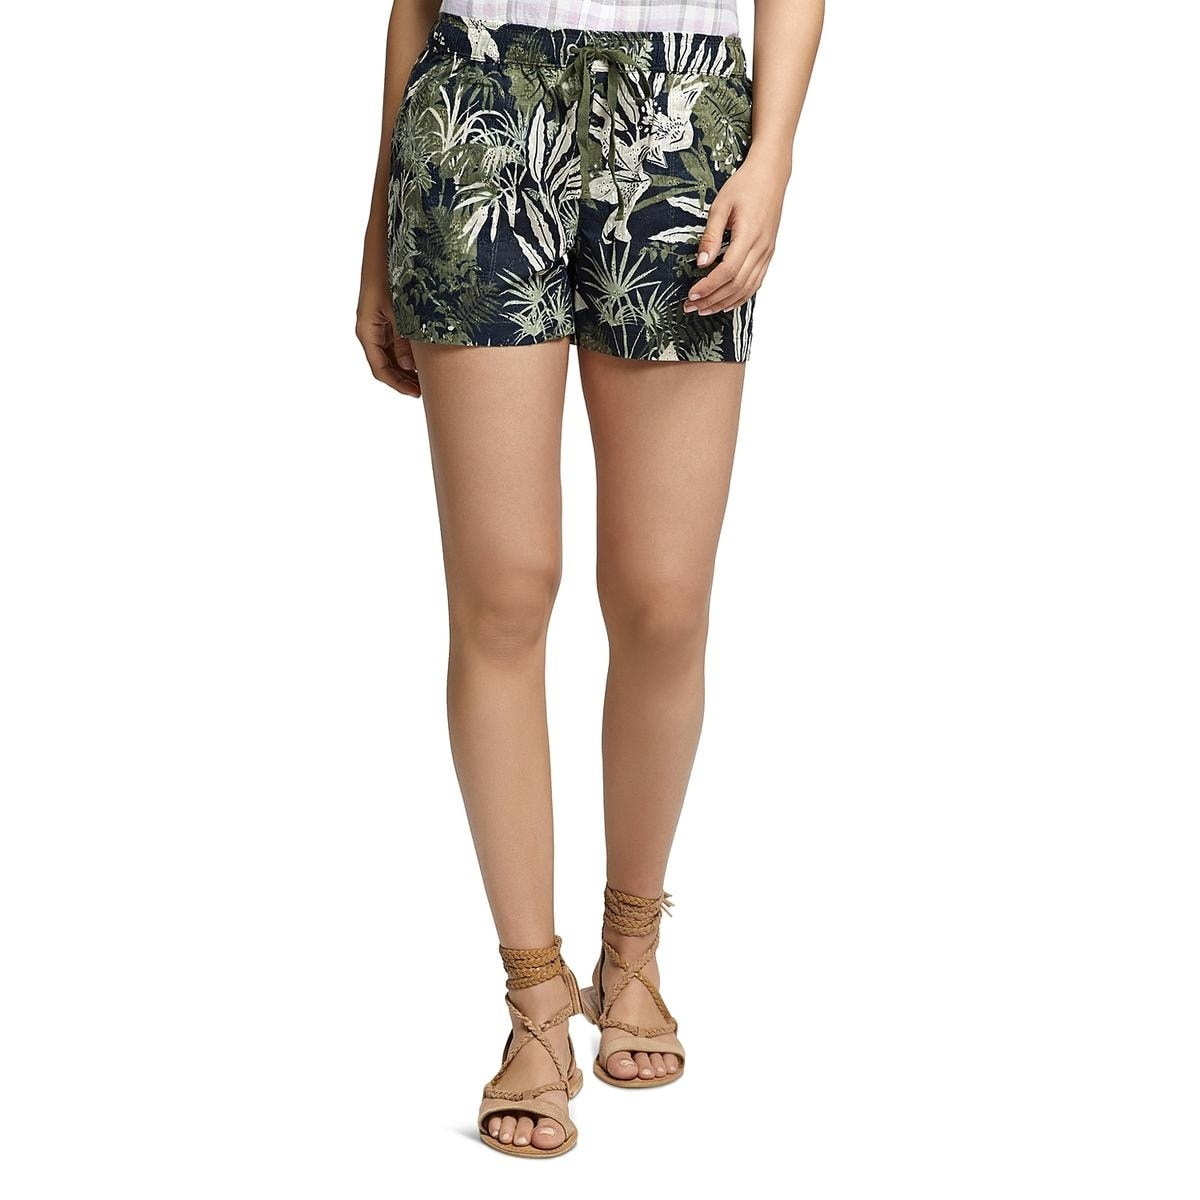 SANCTUARY Womens Black Cuffed Shorts 24 WAIST